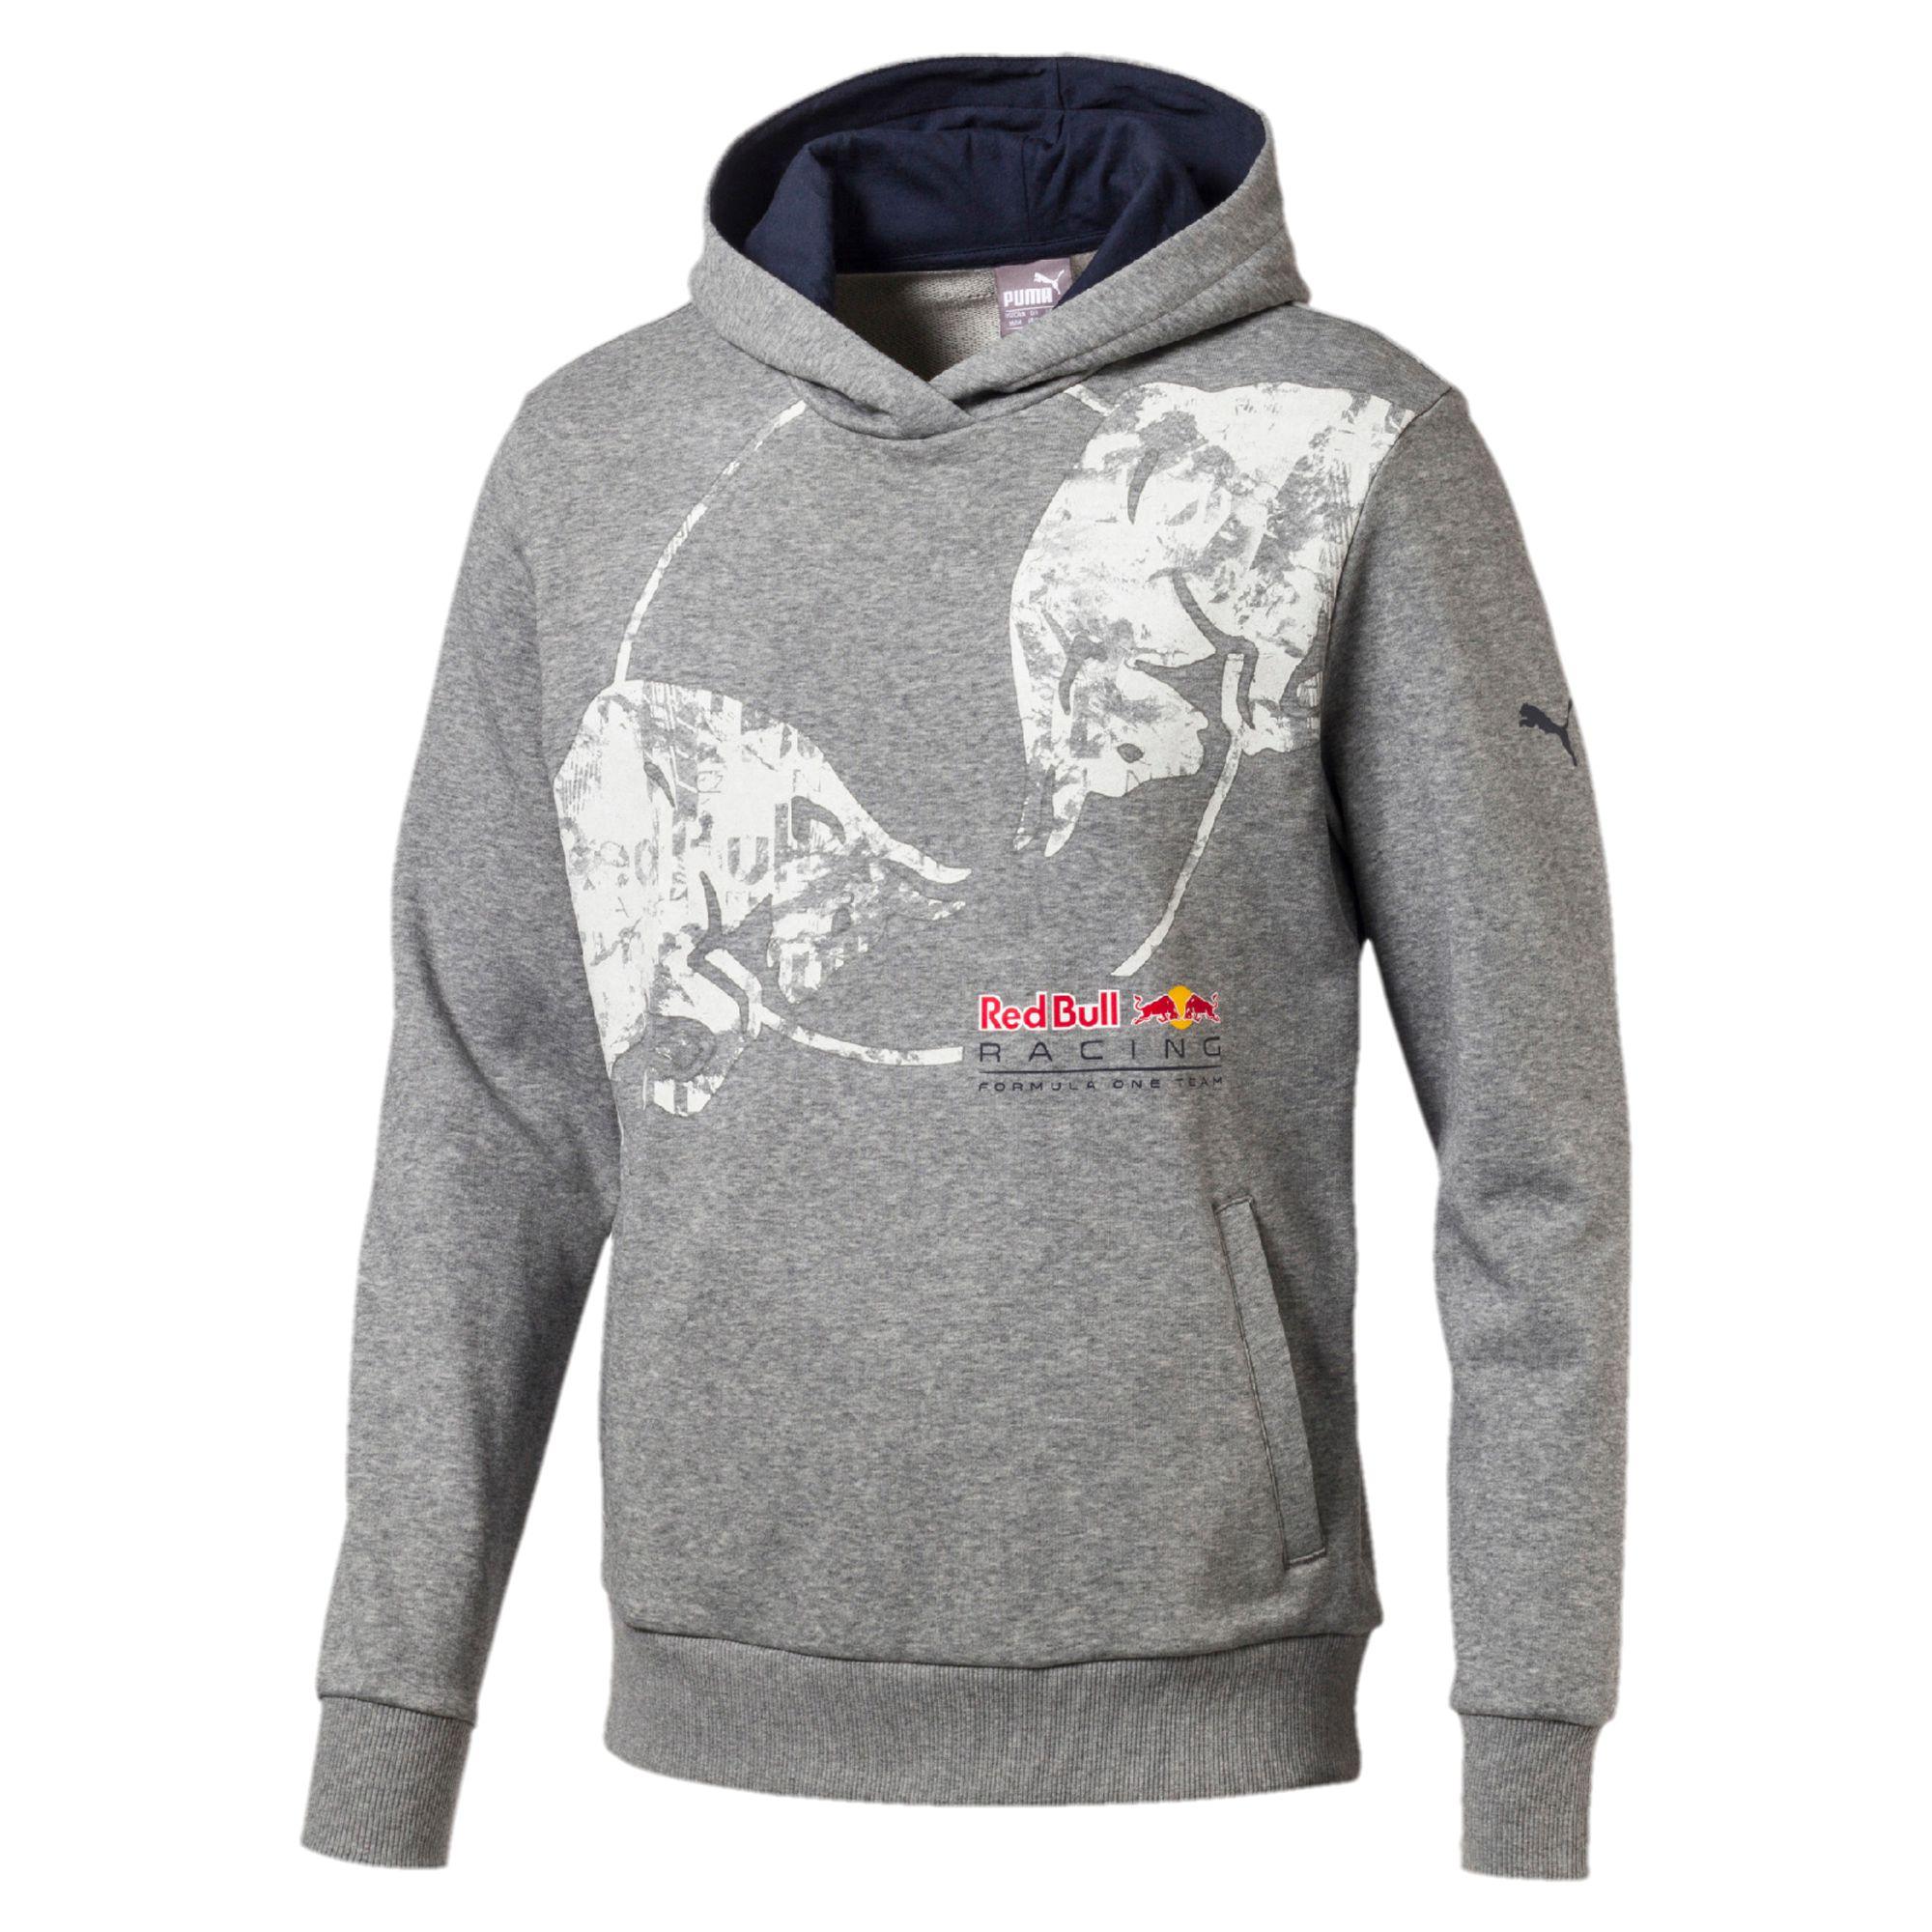 Lifestyle Red Bull Racing Мужские Graphic Hoodie